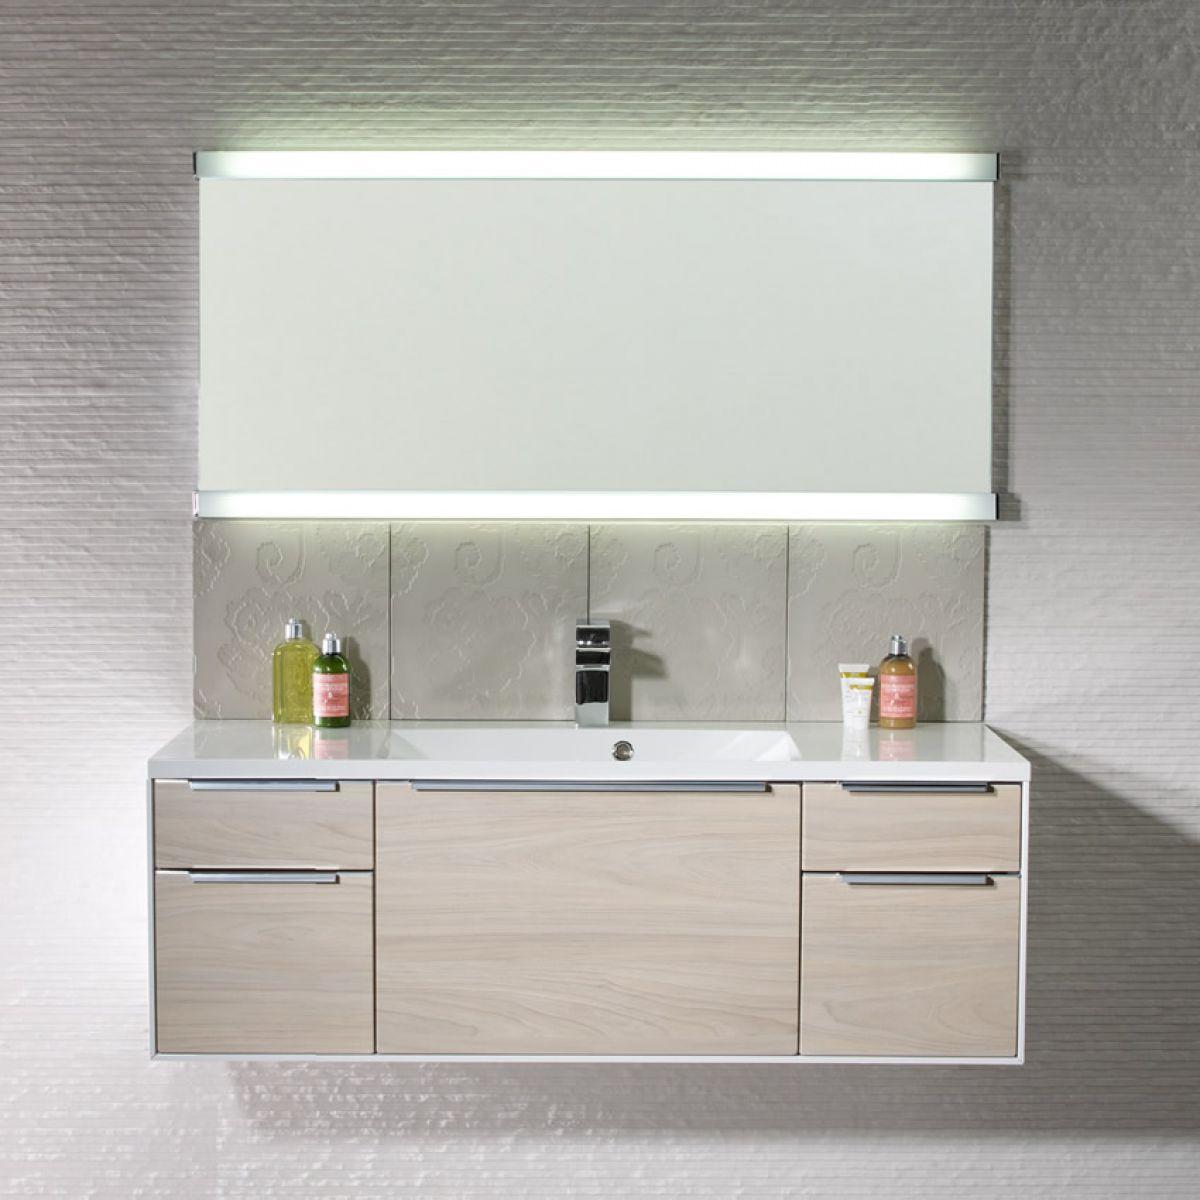 Roper rhodes transcend illuminated bathroom mirror uk for Illuminated mirrors